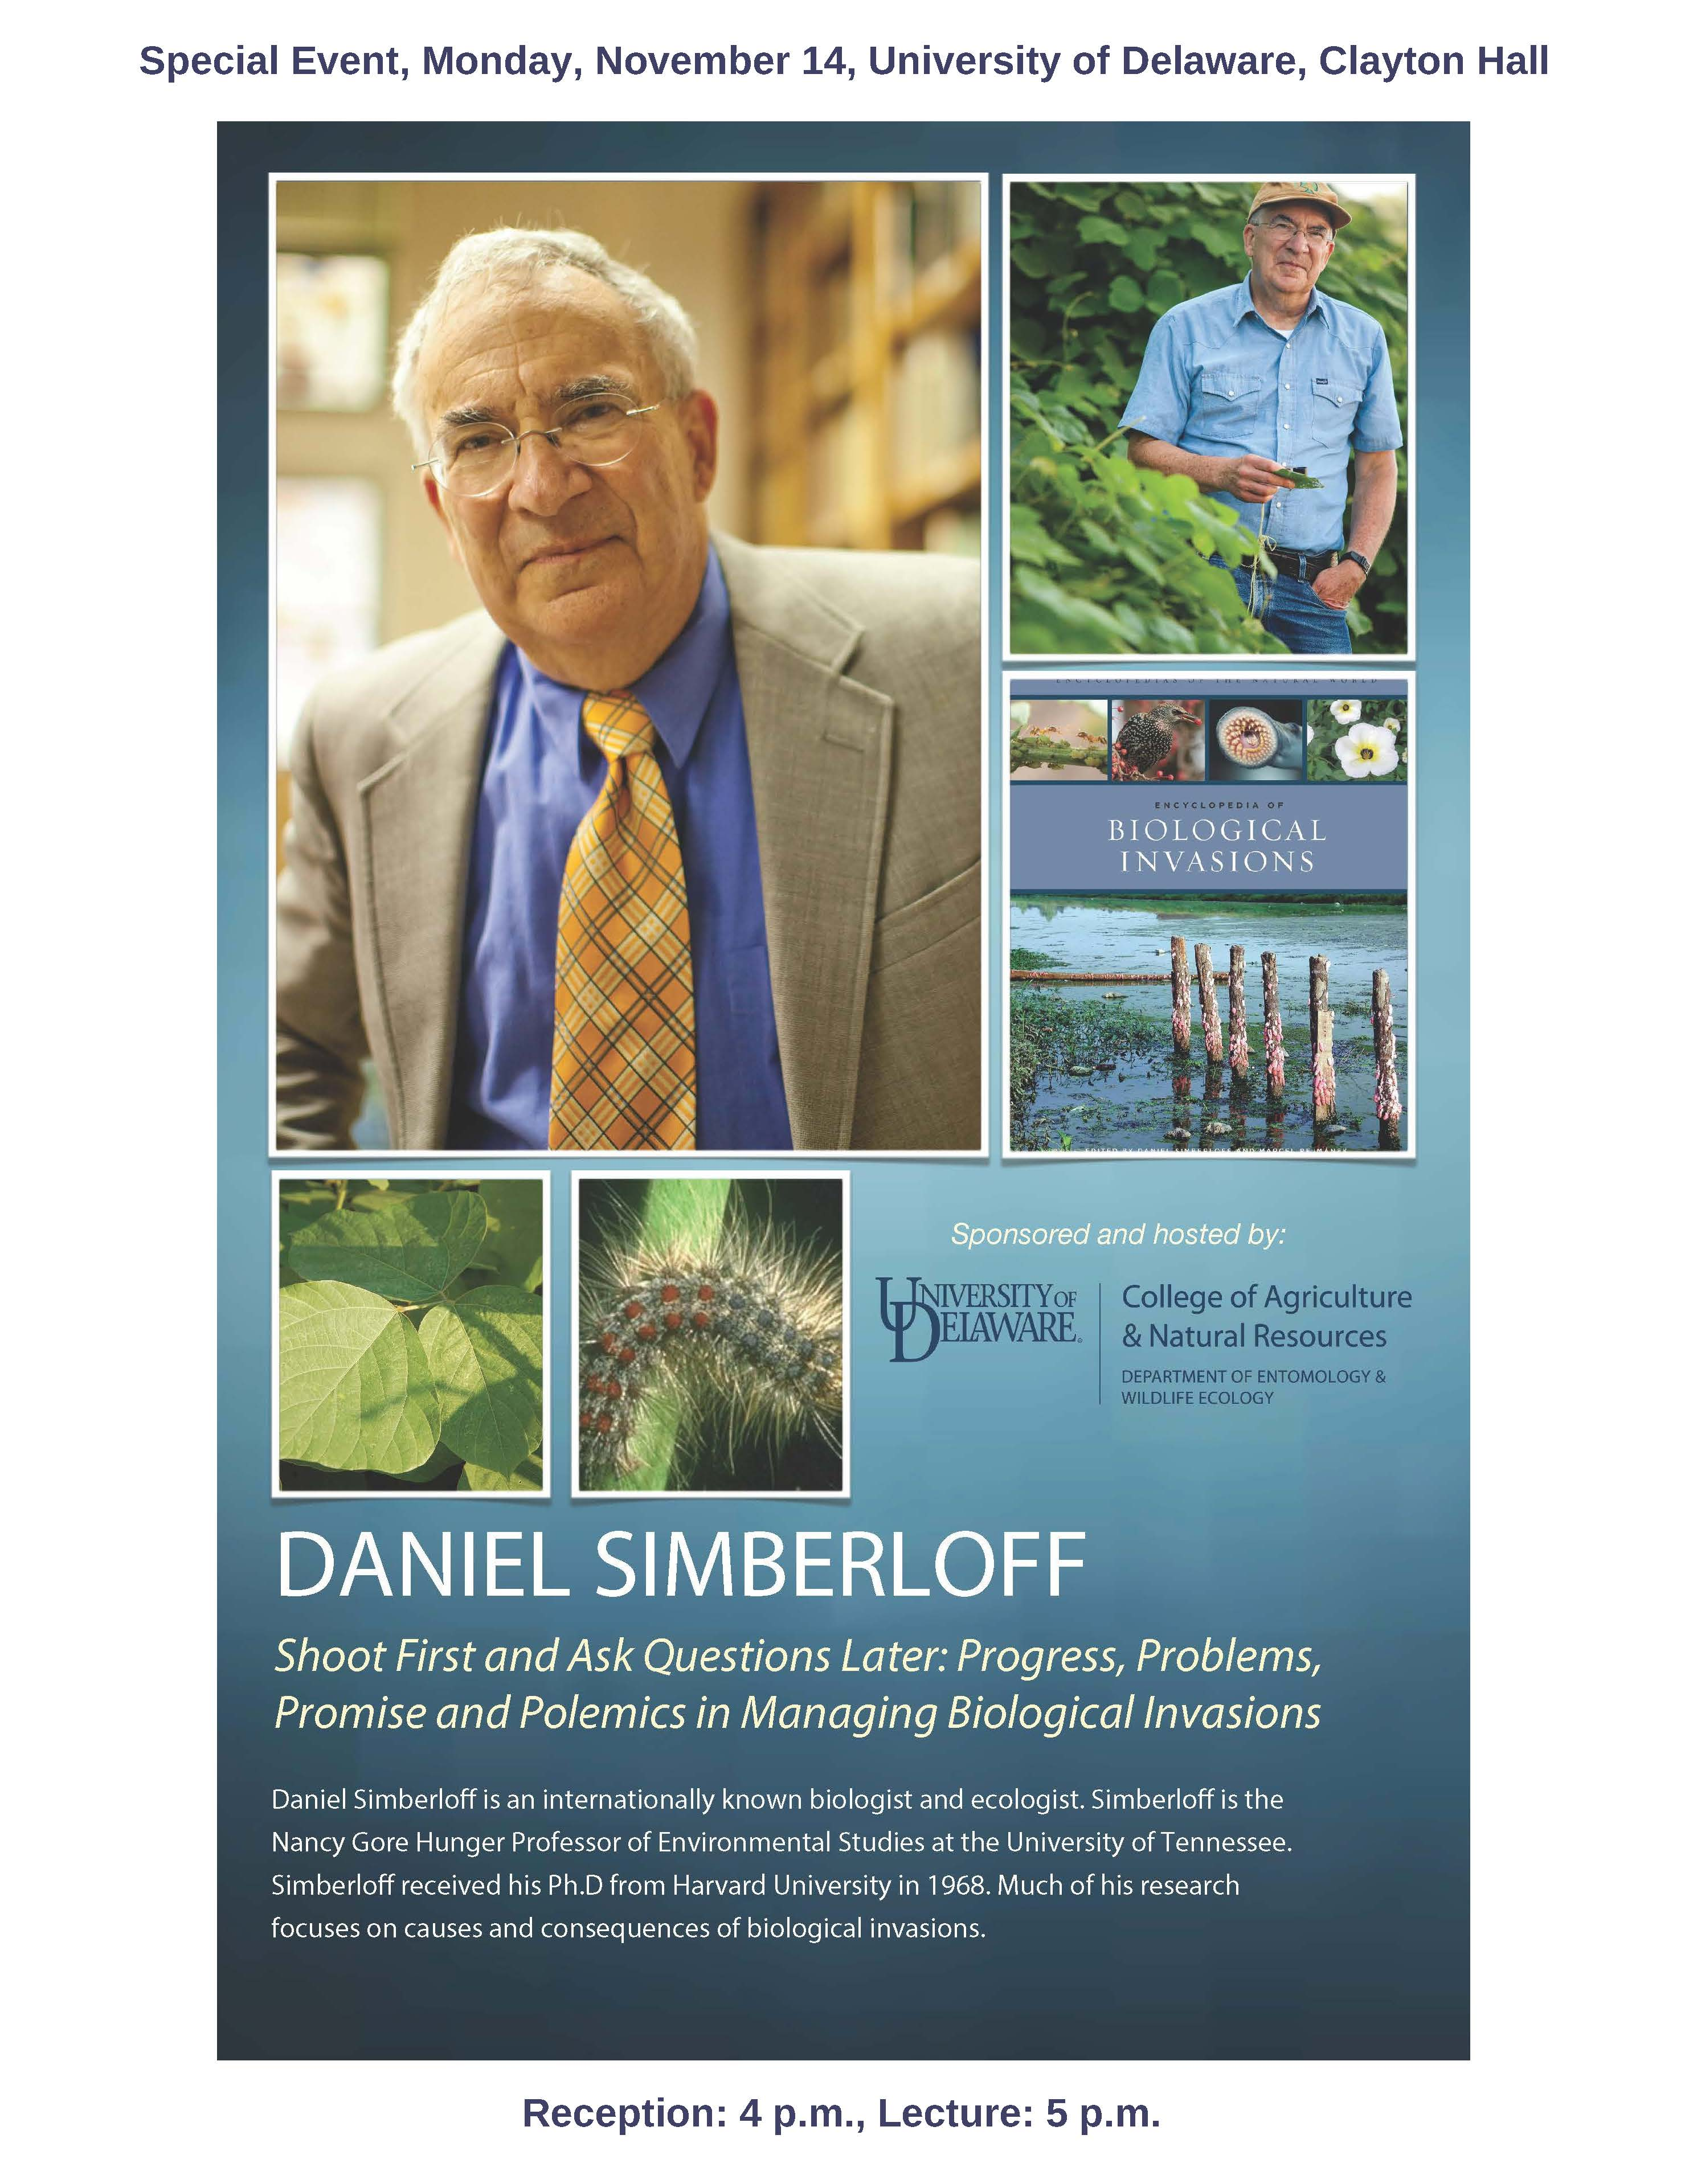 simberloff-lecture-handout